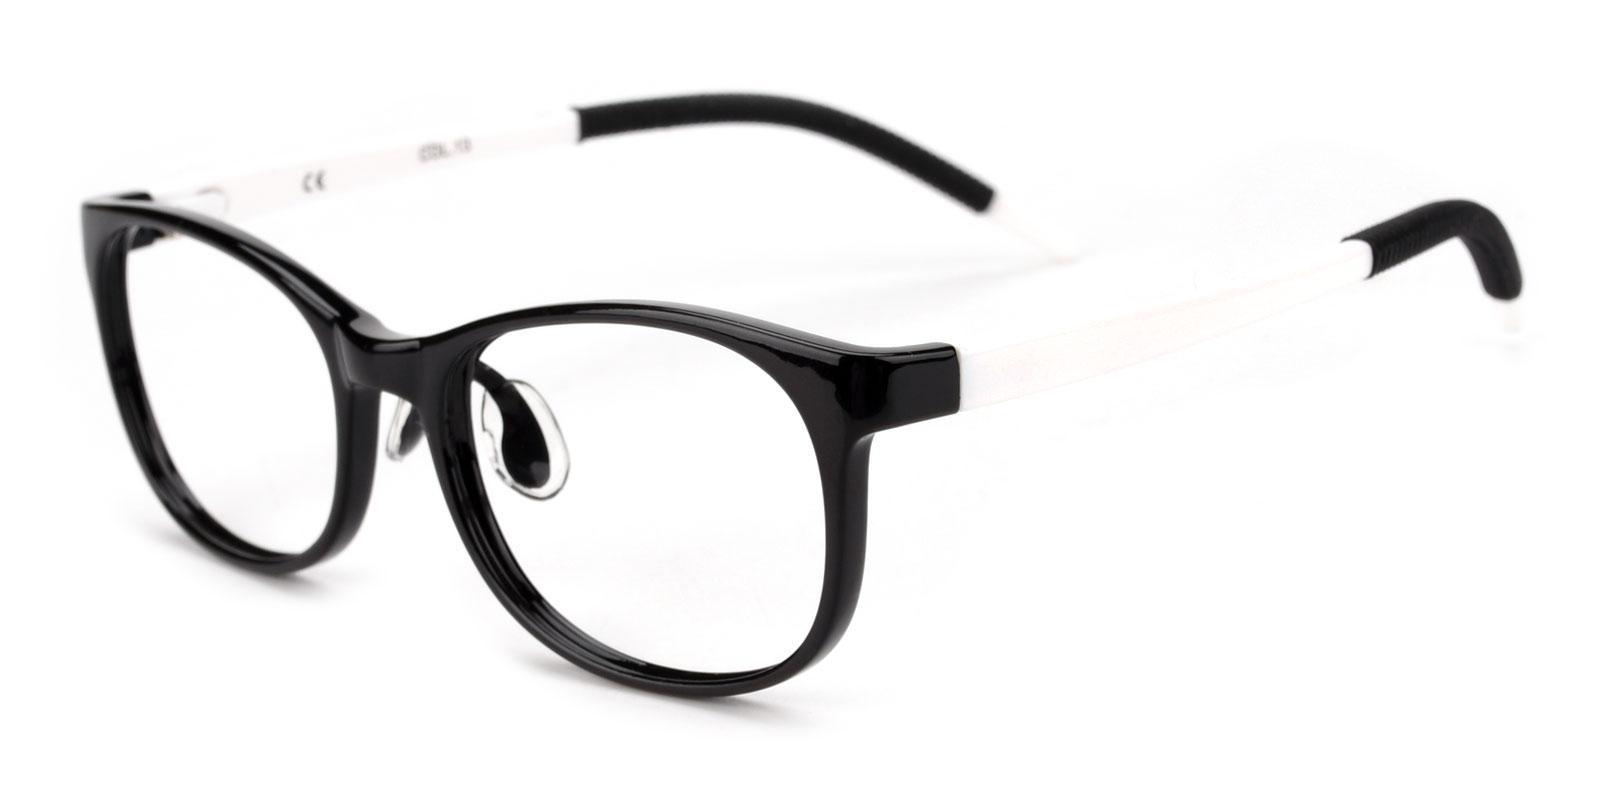 Levan-Black-Oval-TR-Eyeglasses-additional1